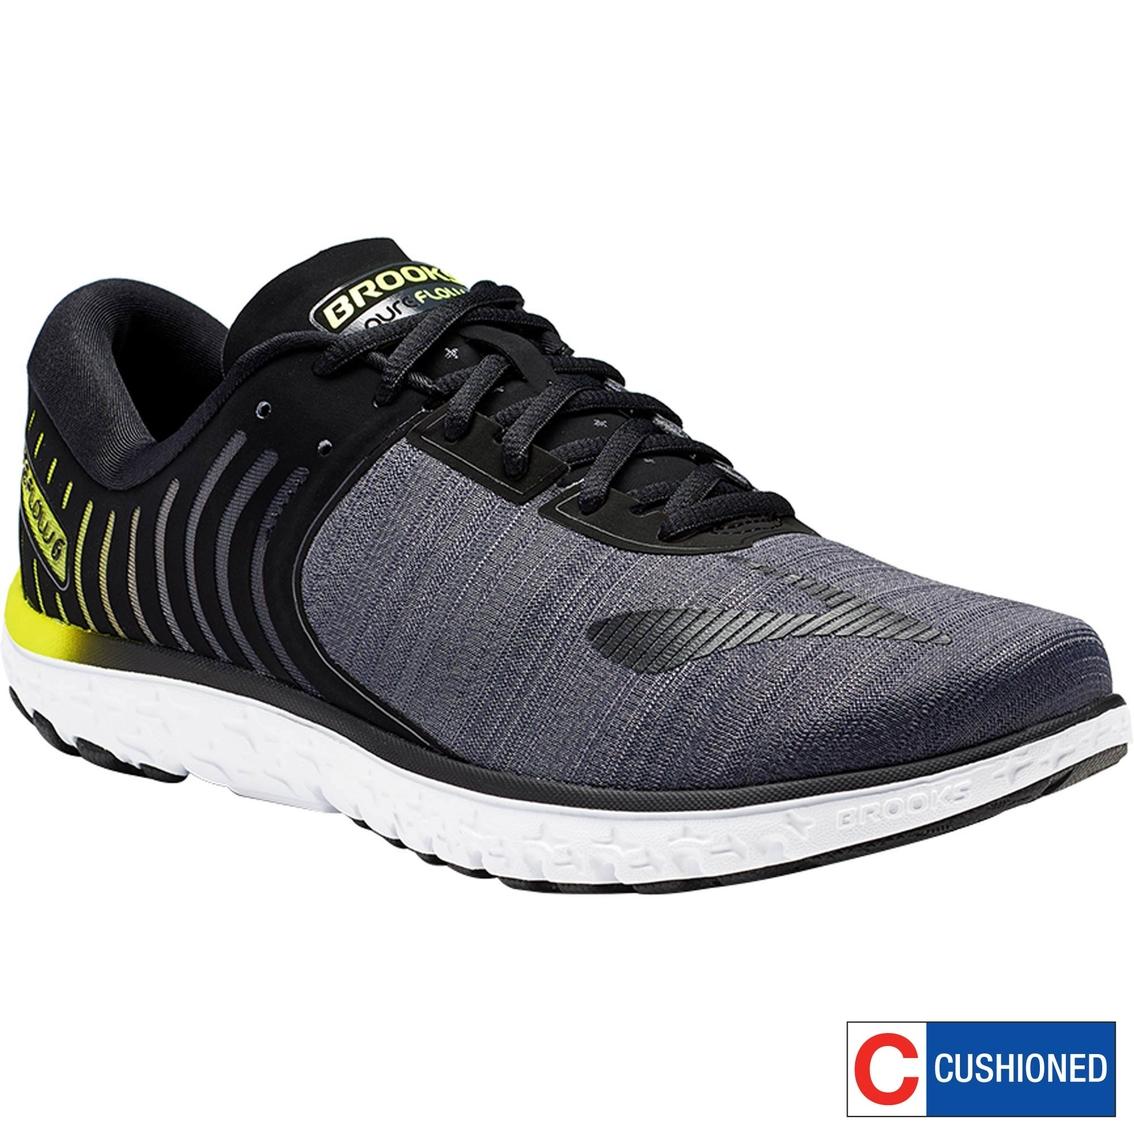 Brooks Men' Pureflow 6 Running Shoes